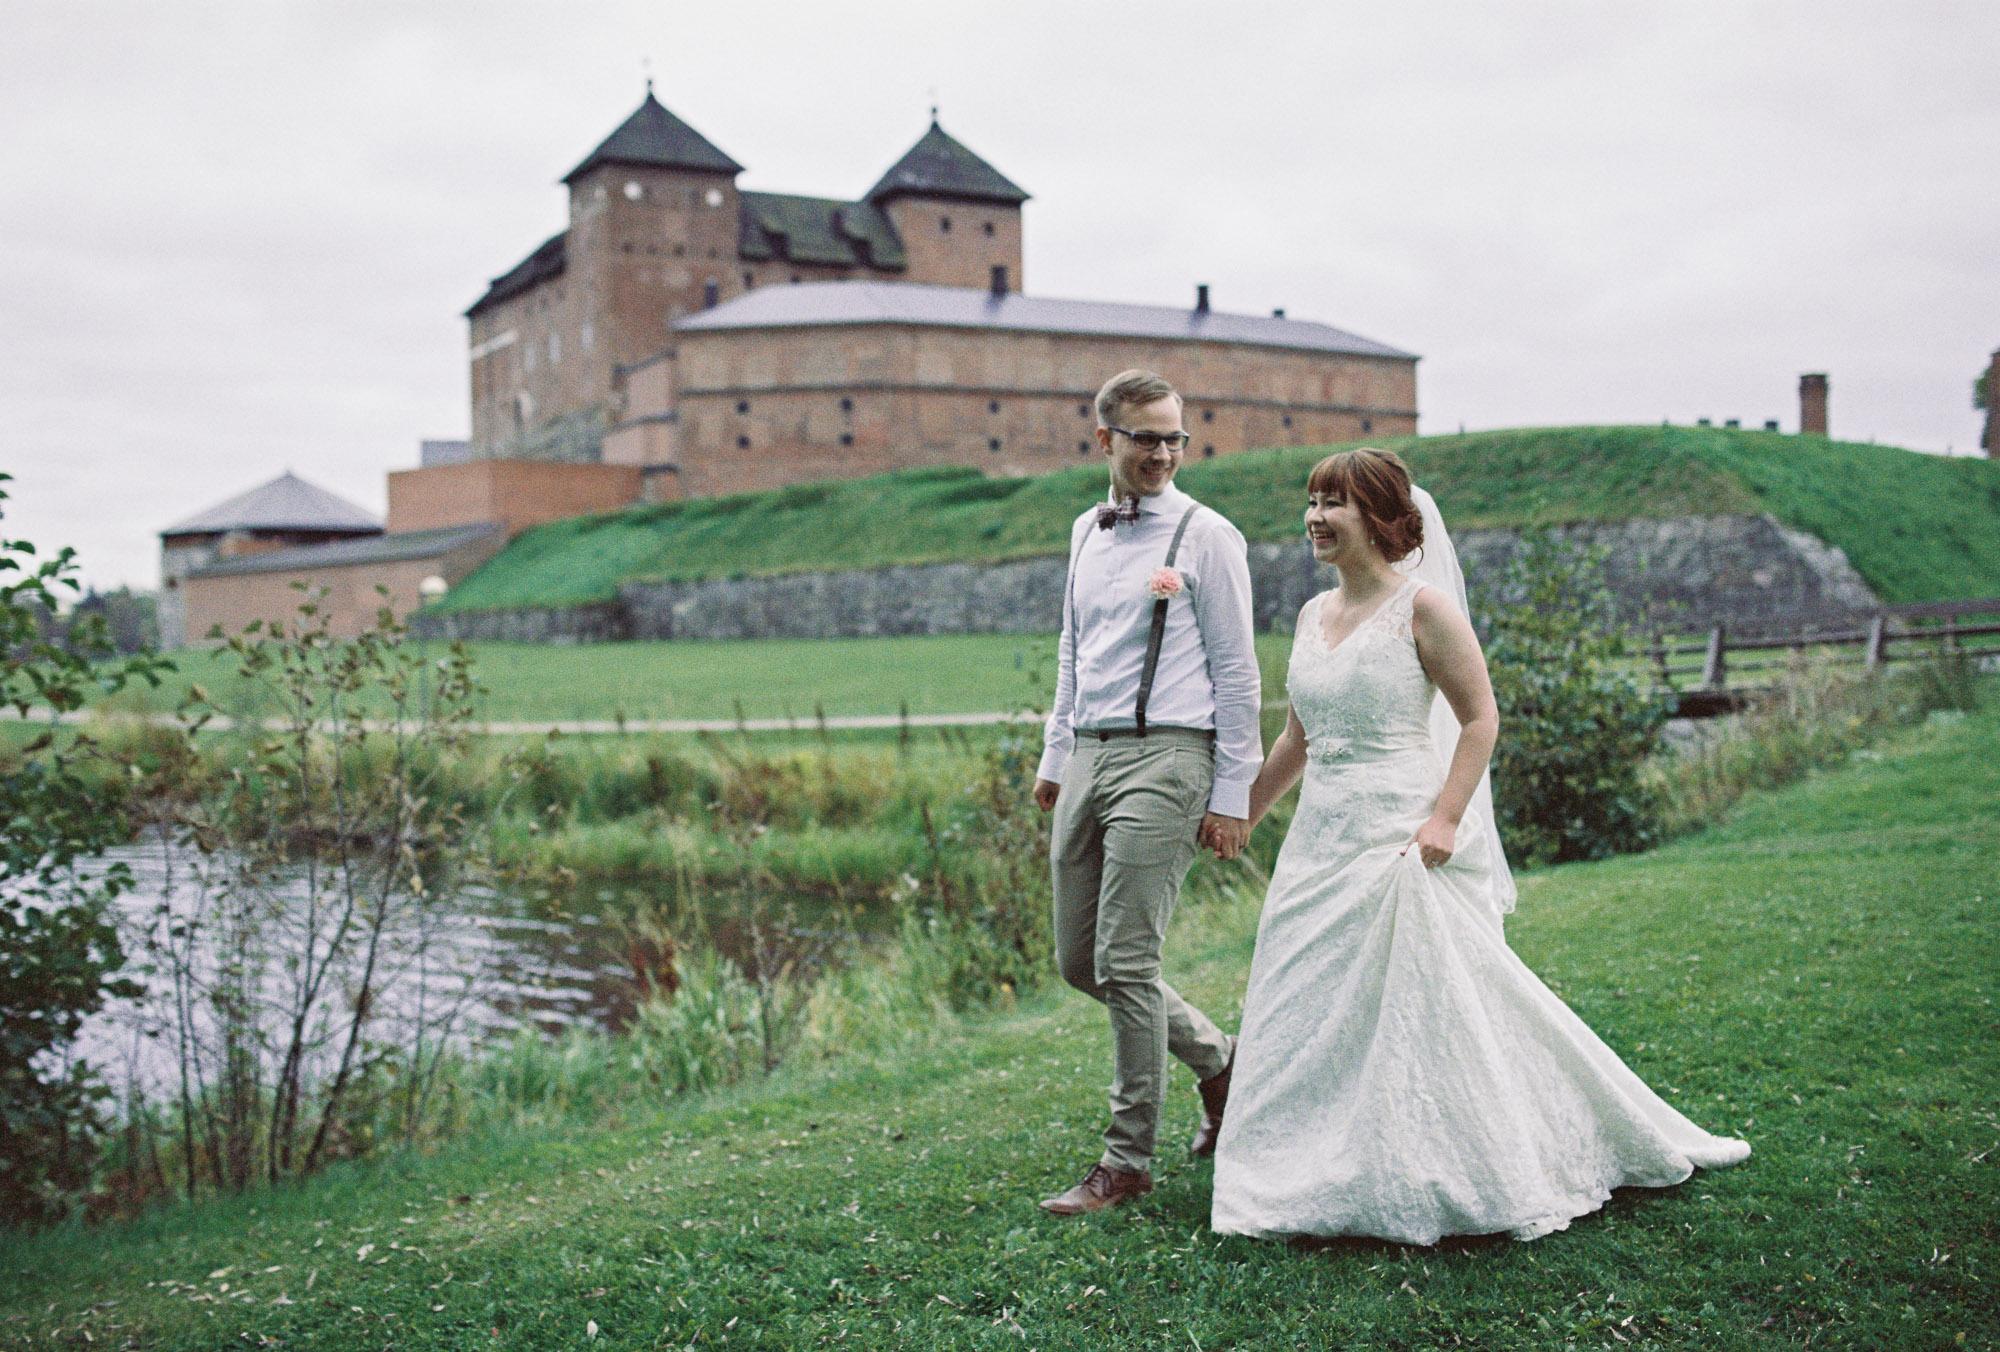 jere-satamo-analog-film-wedding-photographer-finland-146.jpg